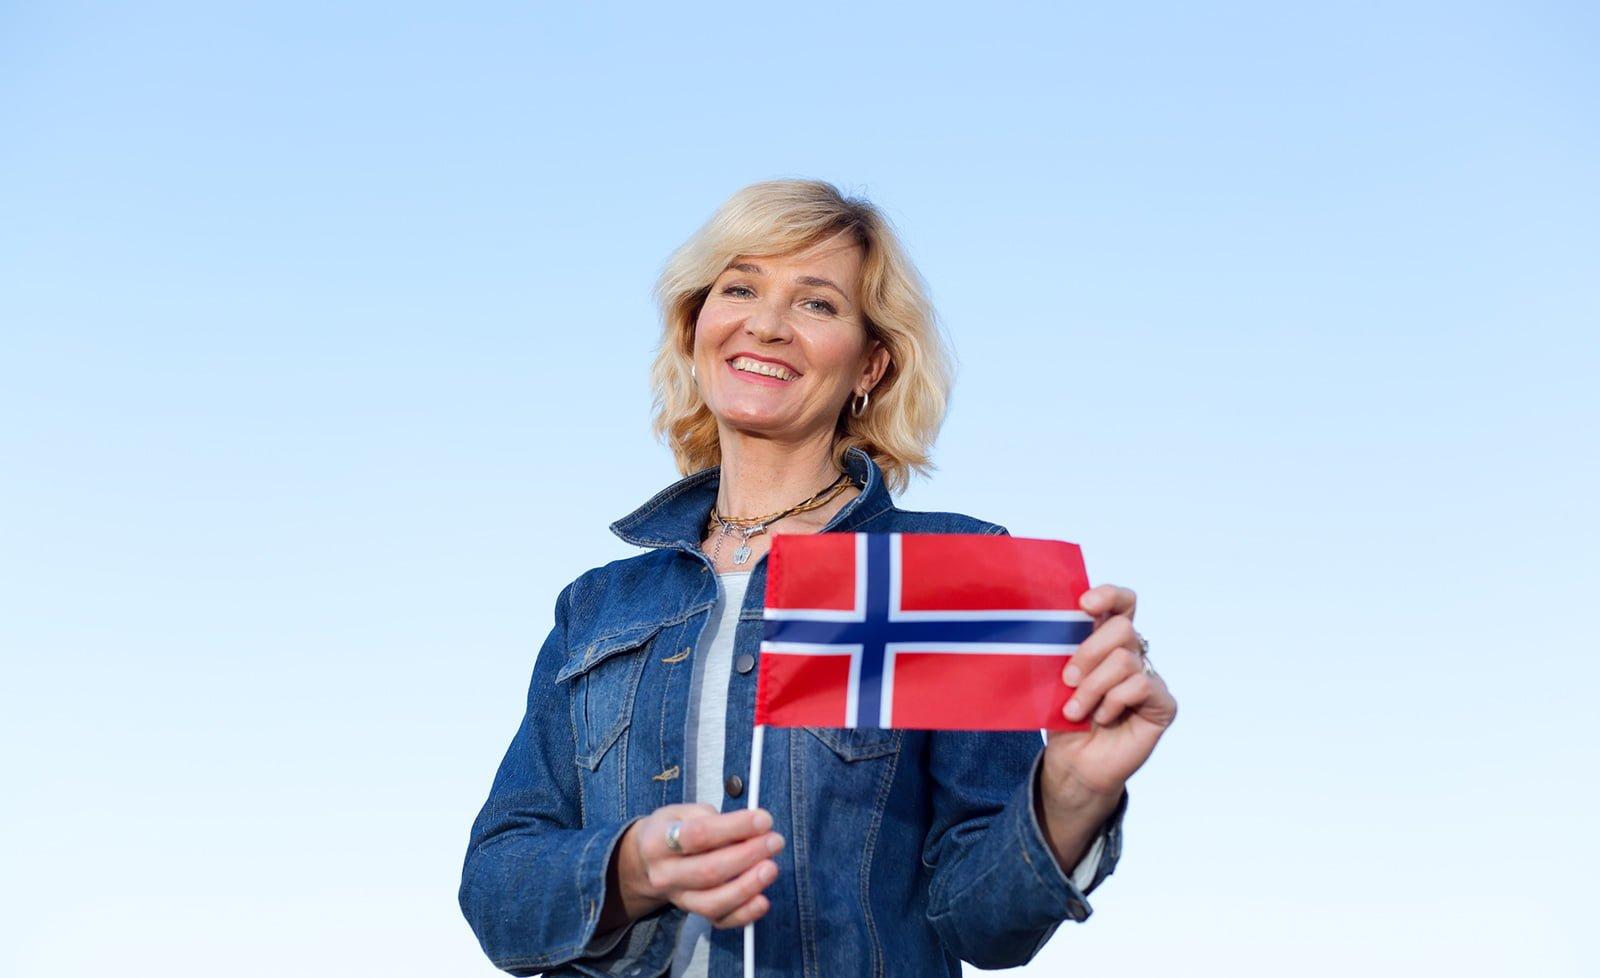 Norwegian language exam student with the flag of Norway